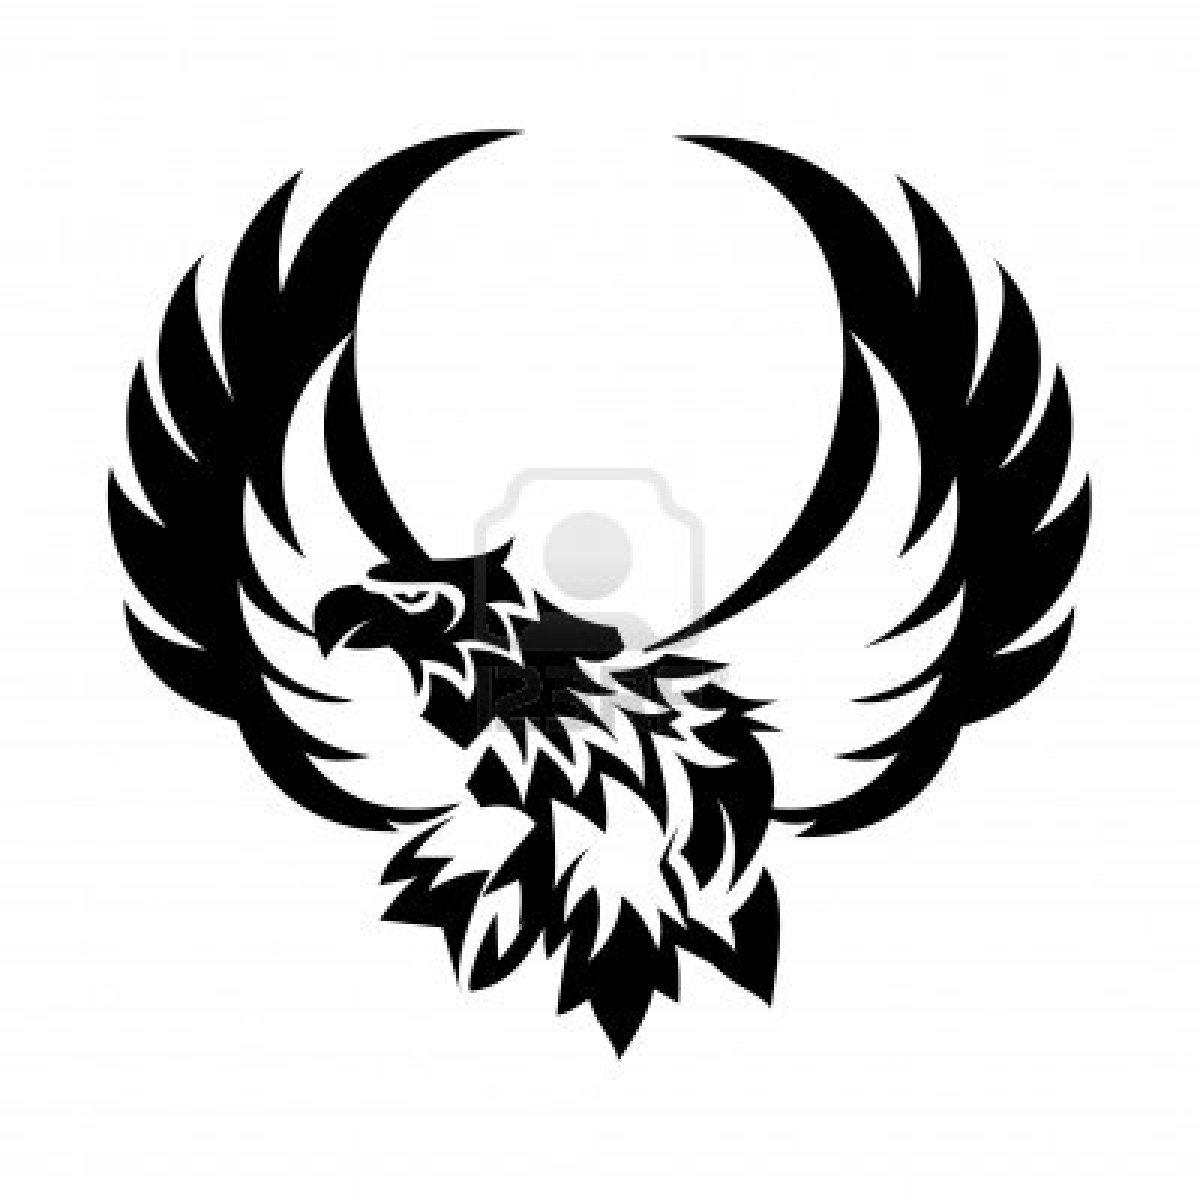 1203x1203 Open Wings Eagle Tattoo Design Clipart Panda